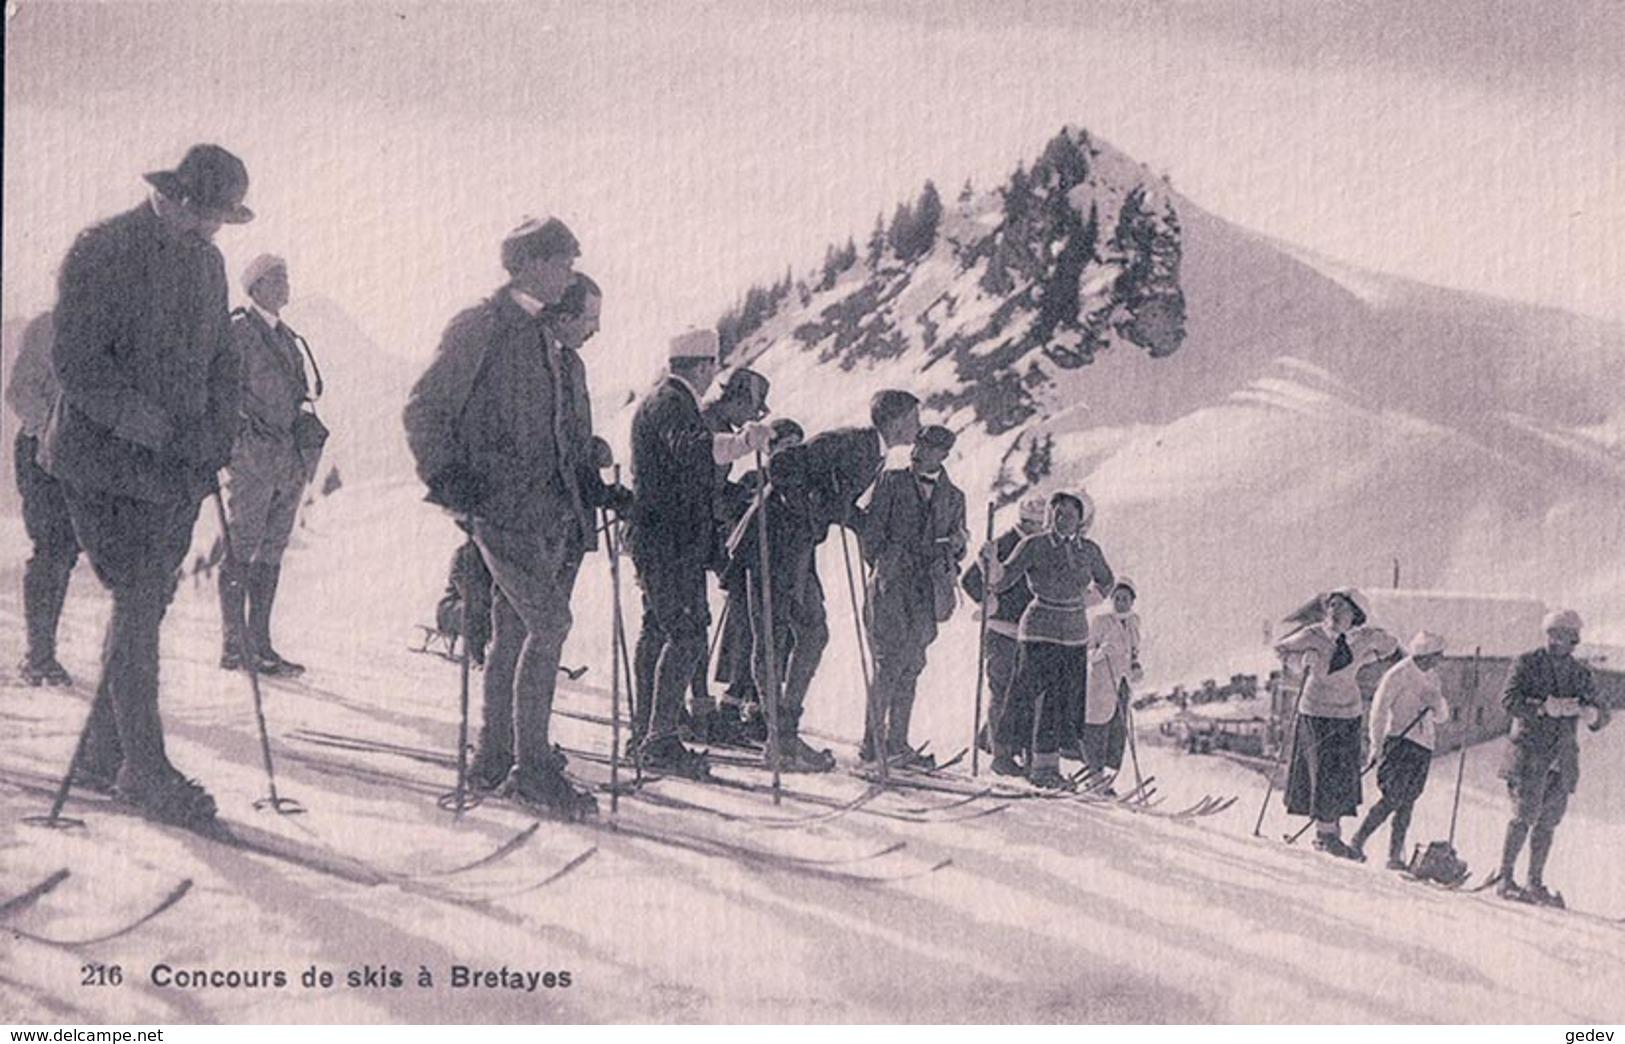 Bretayes, Sport D'Hiver, Concours De Skis + Cachet Restaurant Henri Genillard Prop. (216) - VD Vaud